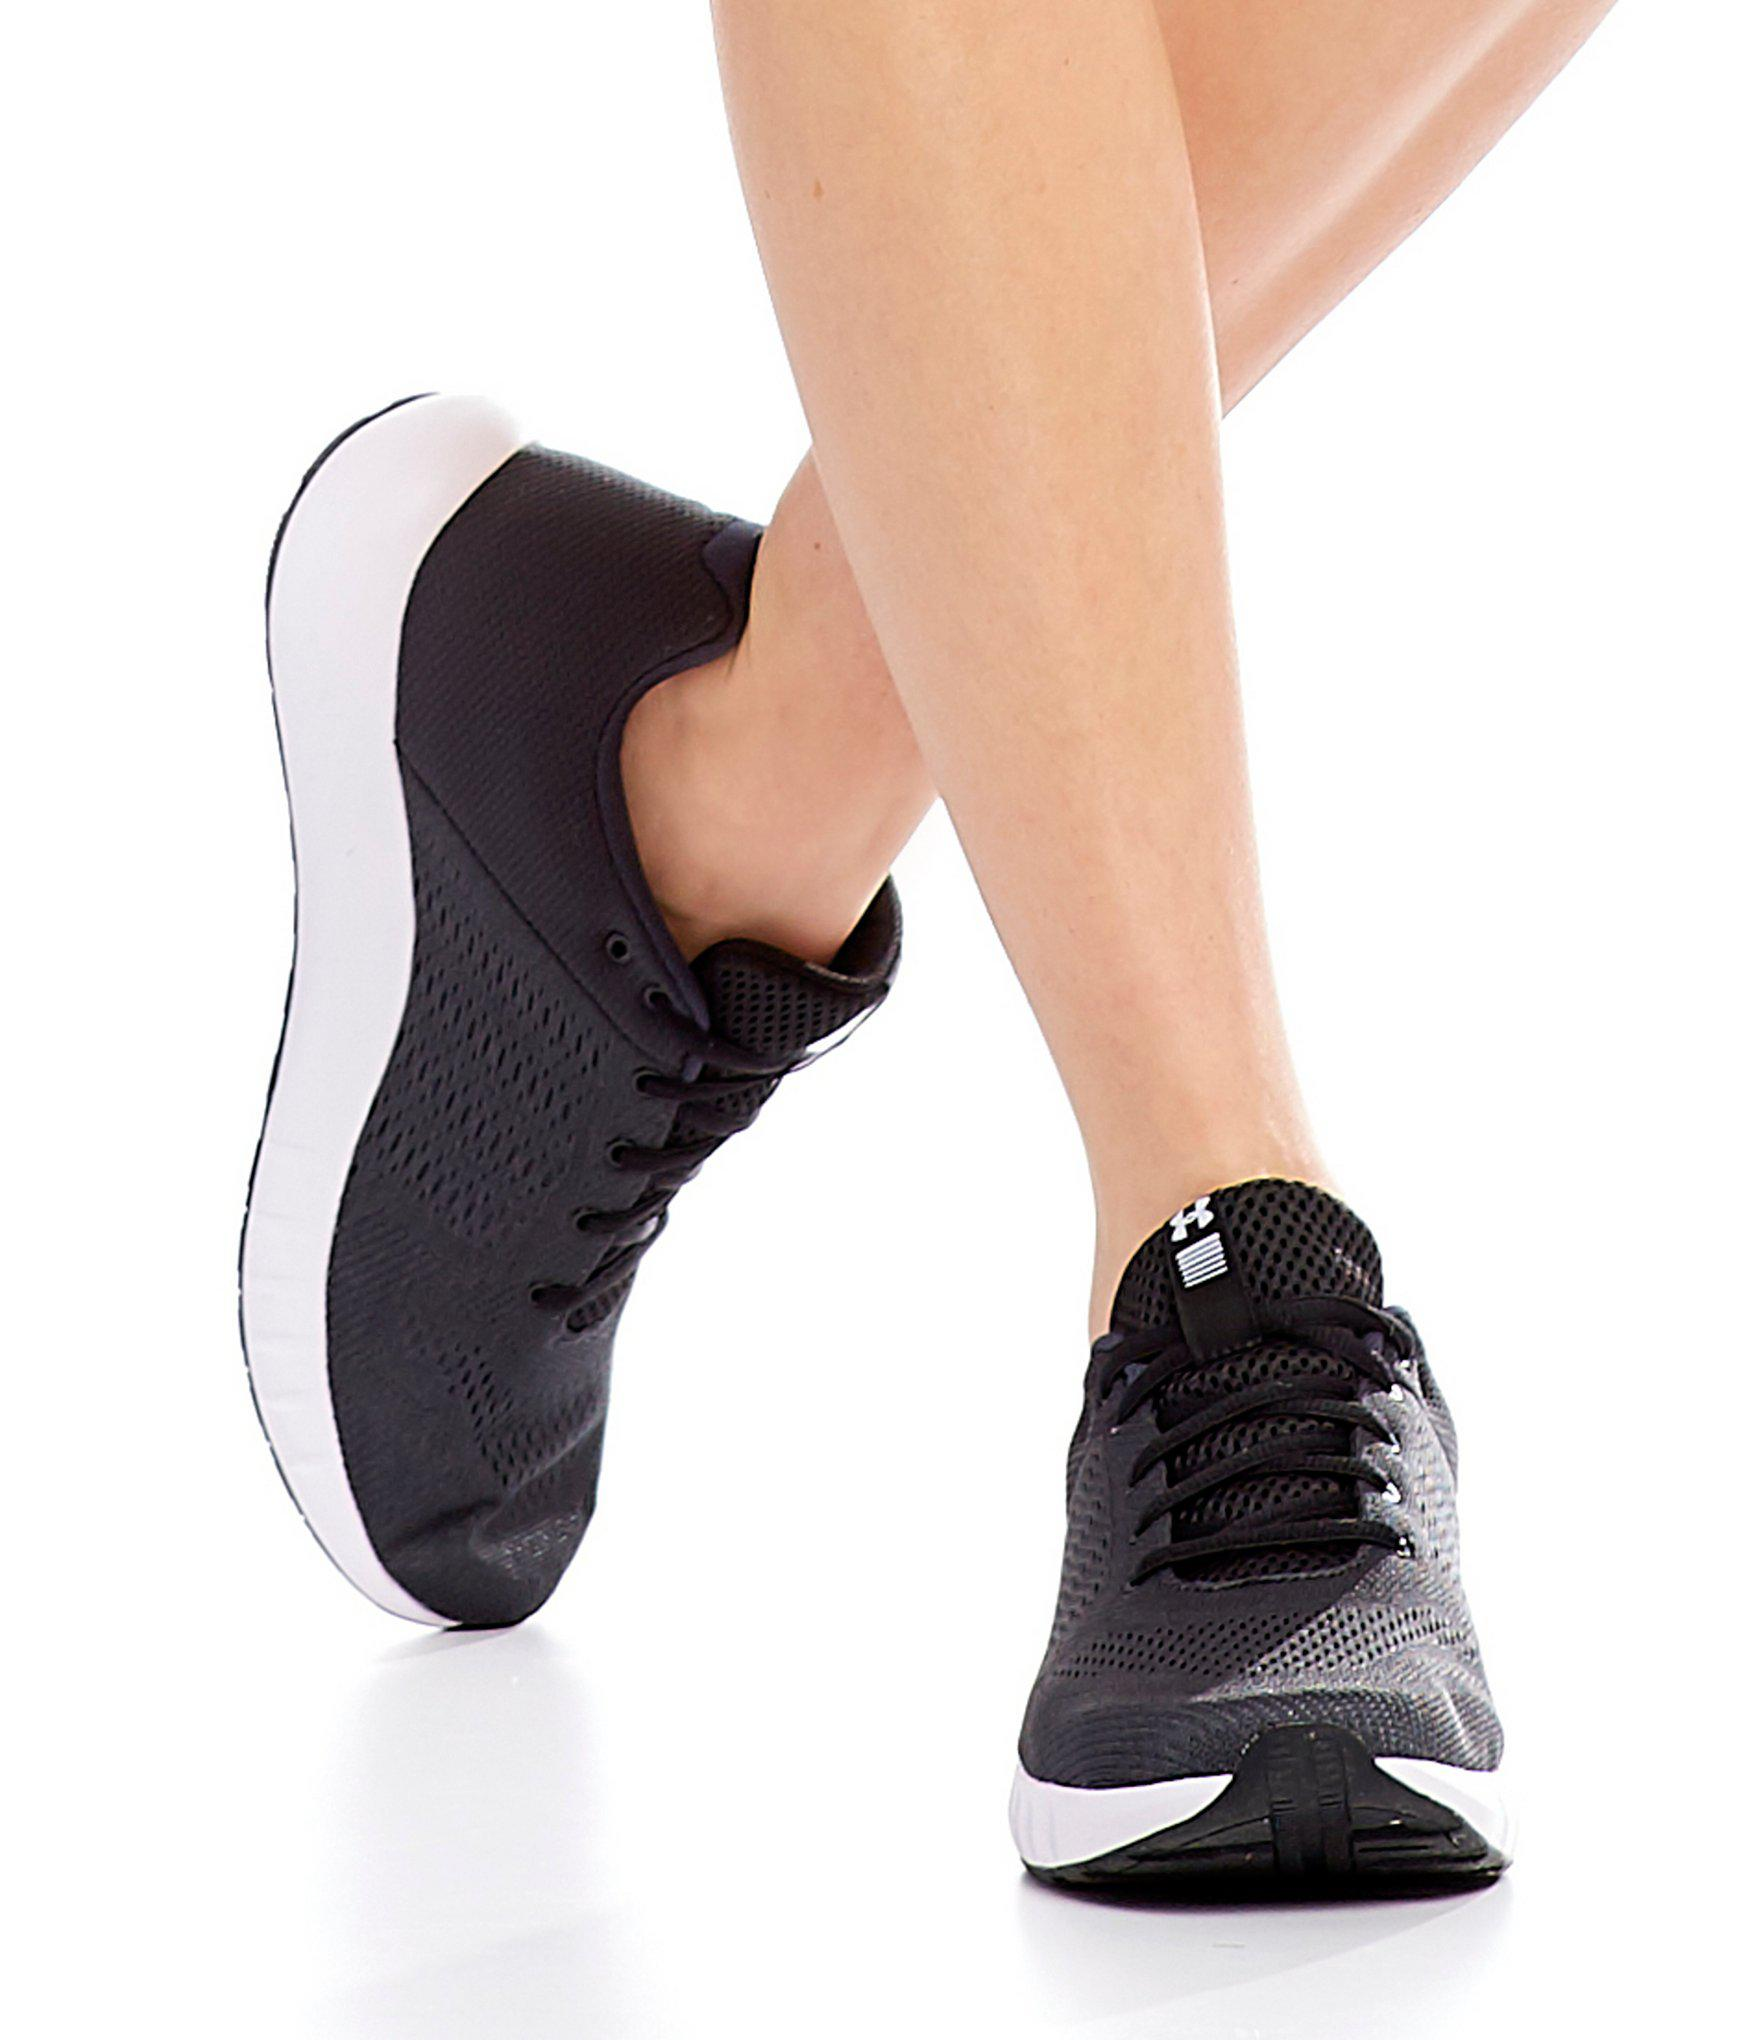 0901fb34742b2 Under Armour Black Women's Micro G Pursuit Sneakers